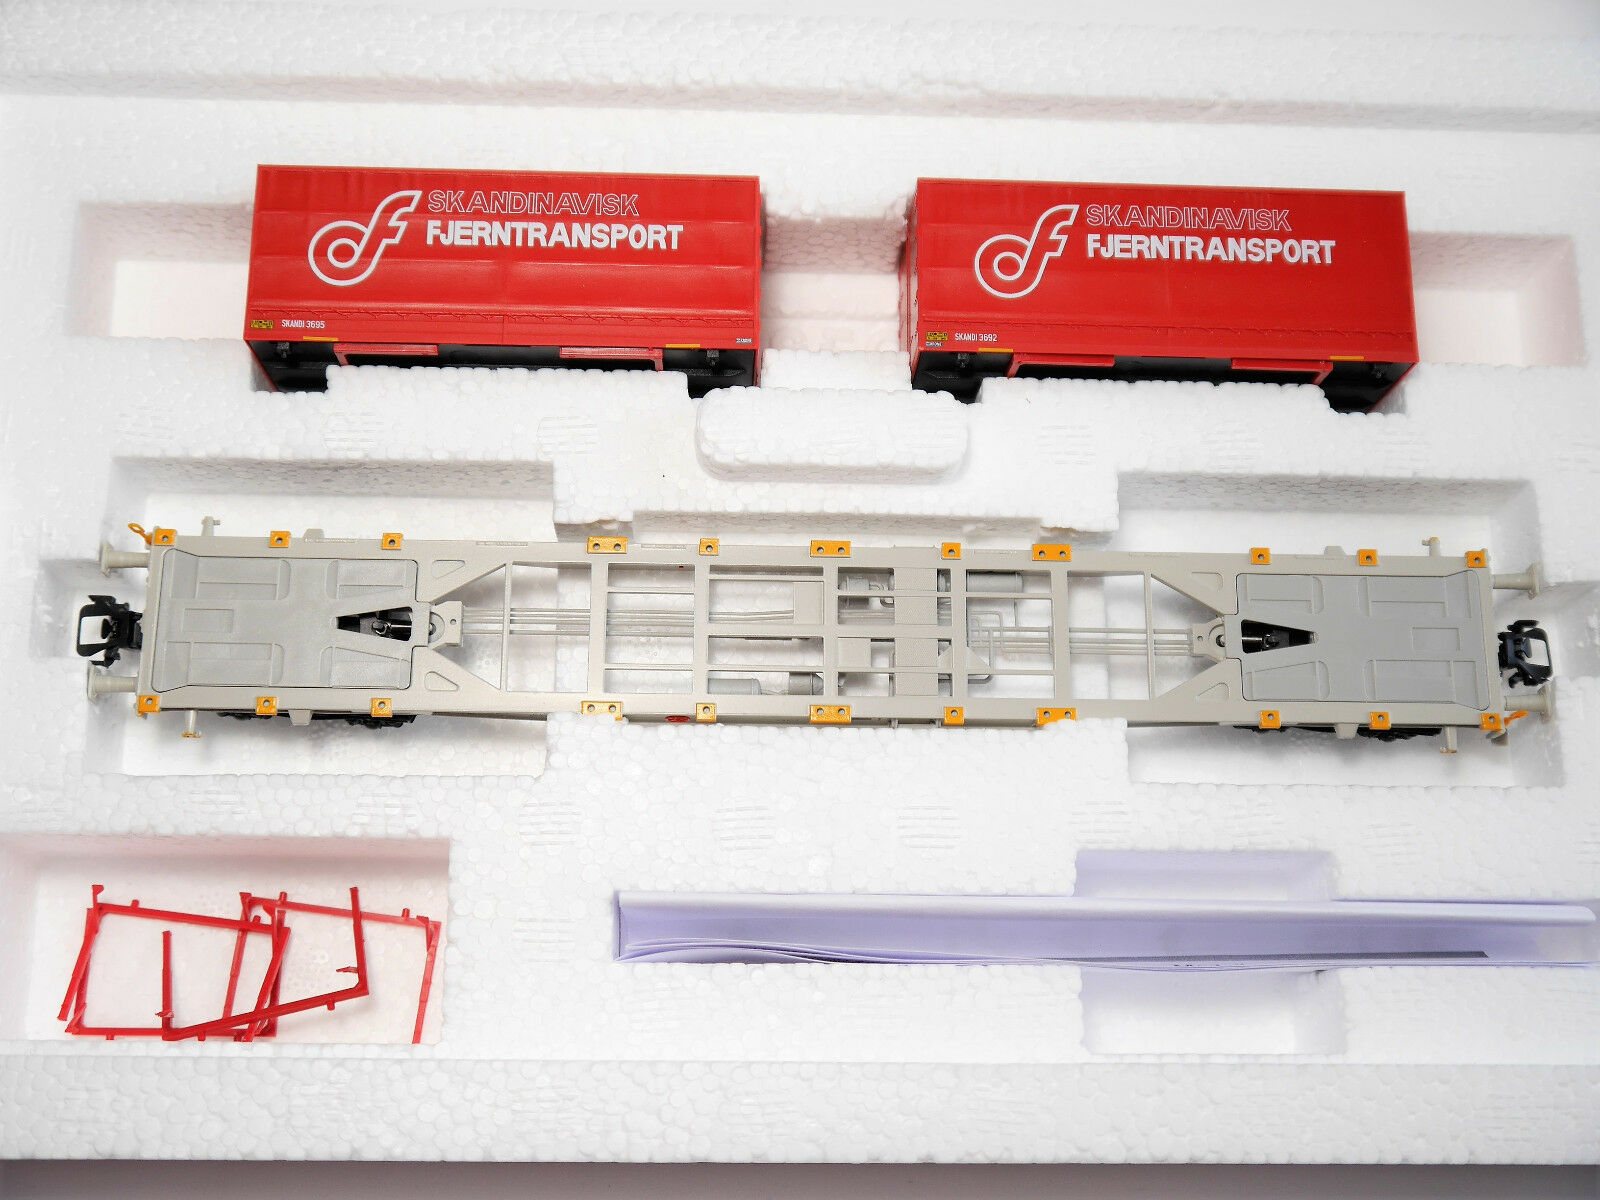 RIV container carrello portante Kaffekompagni fjerntransport    47083-01 1:87 h0 BXD